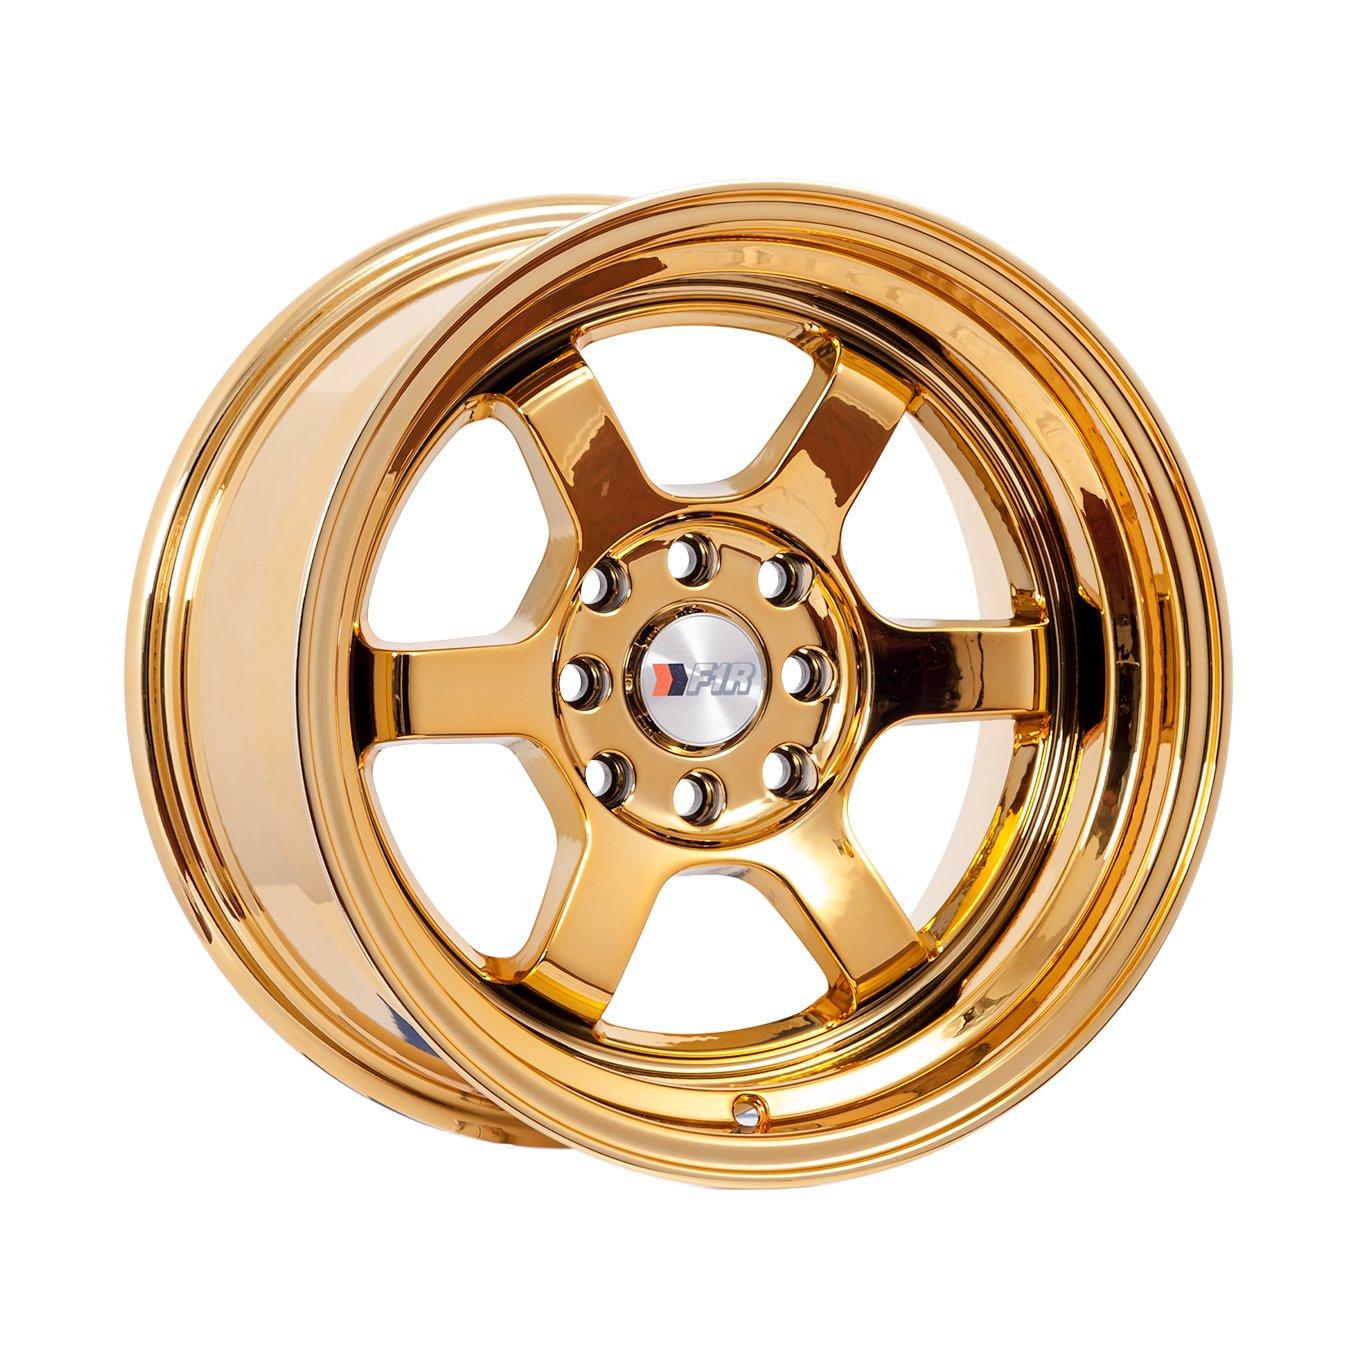 15x8 F1R F05 Gold Chrome Rim Offset(0) Lug(4x100/4x114.3) Bore(67.1) 1 Wheel -- F05158GC0